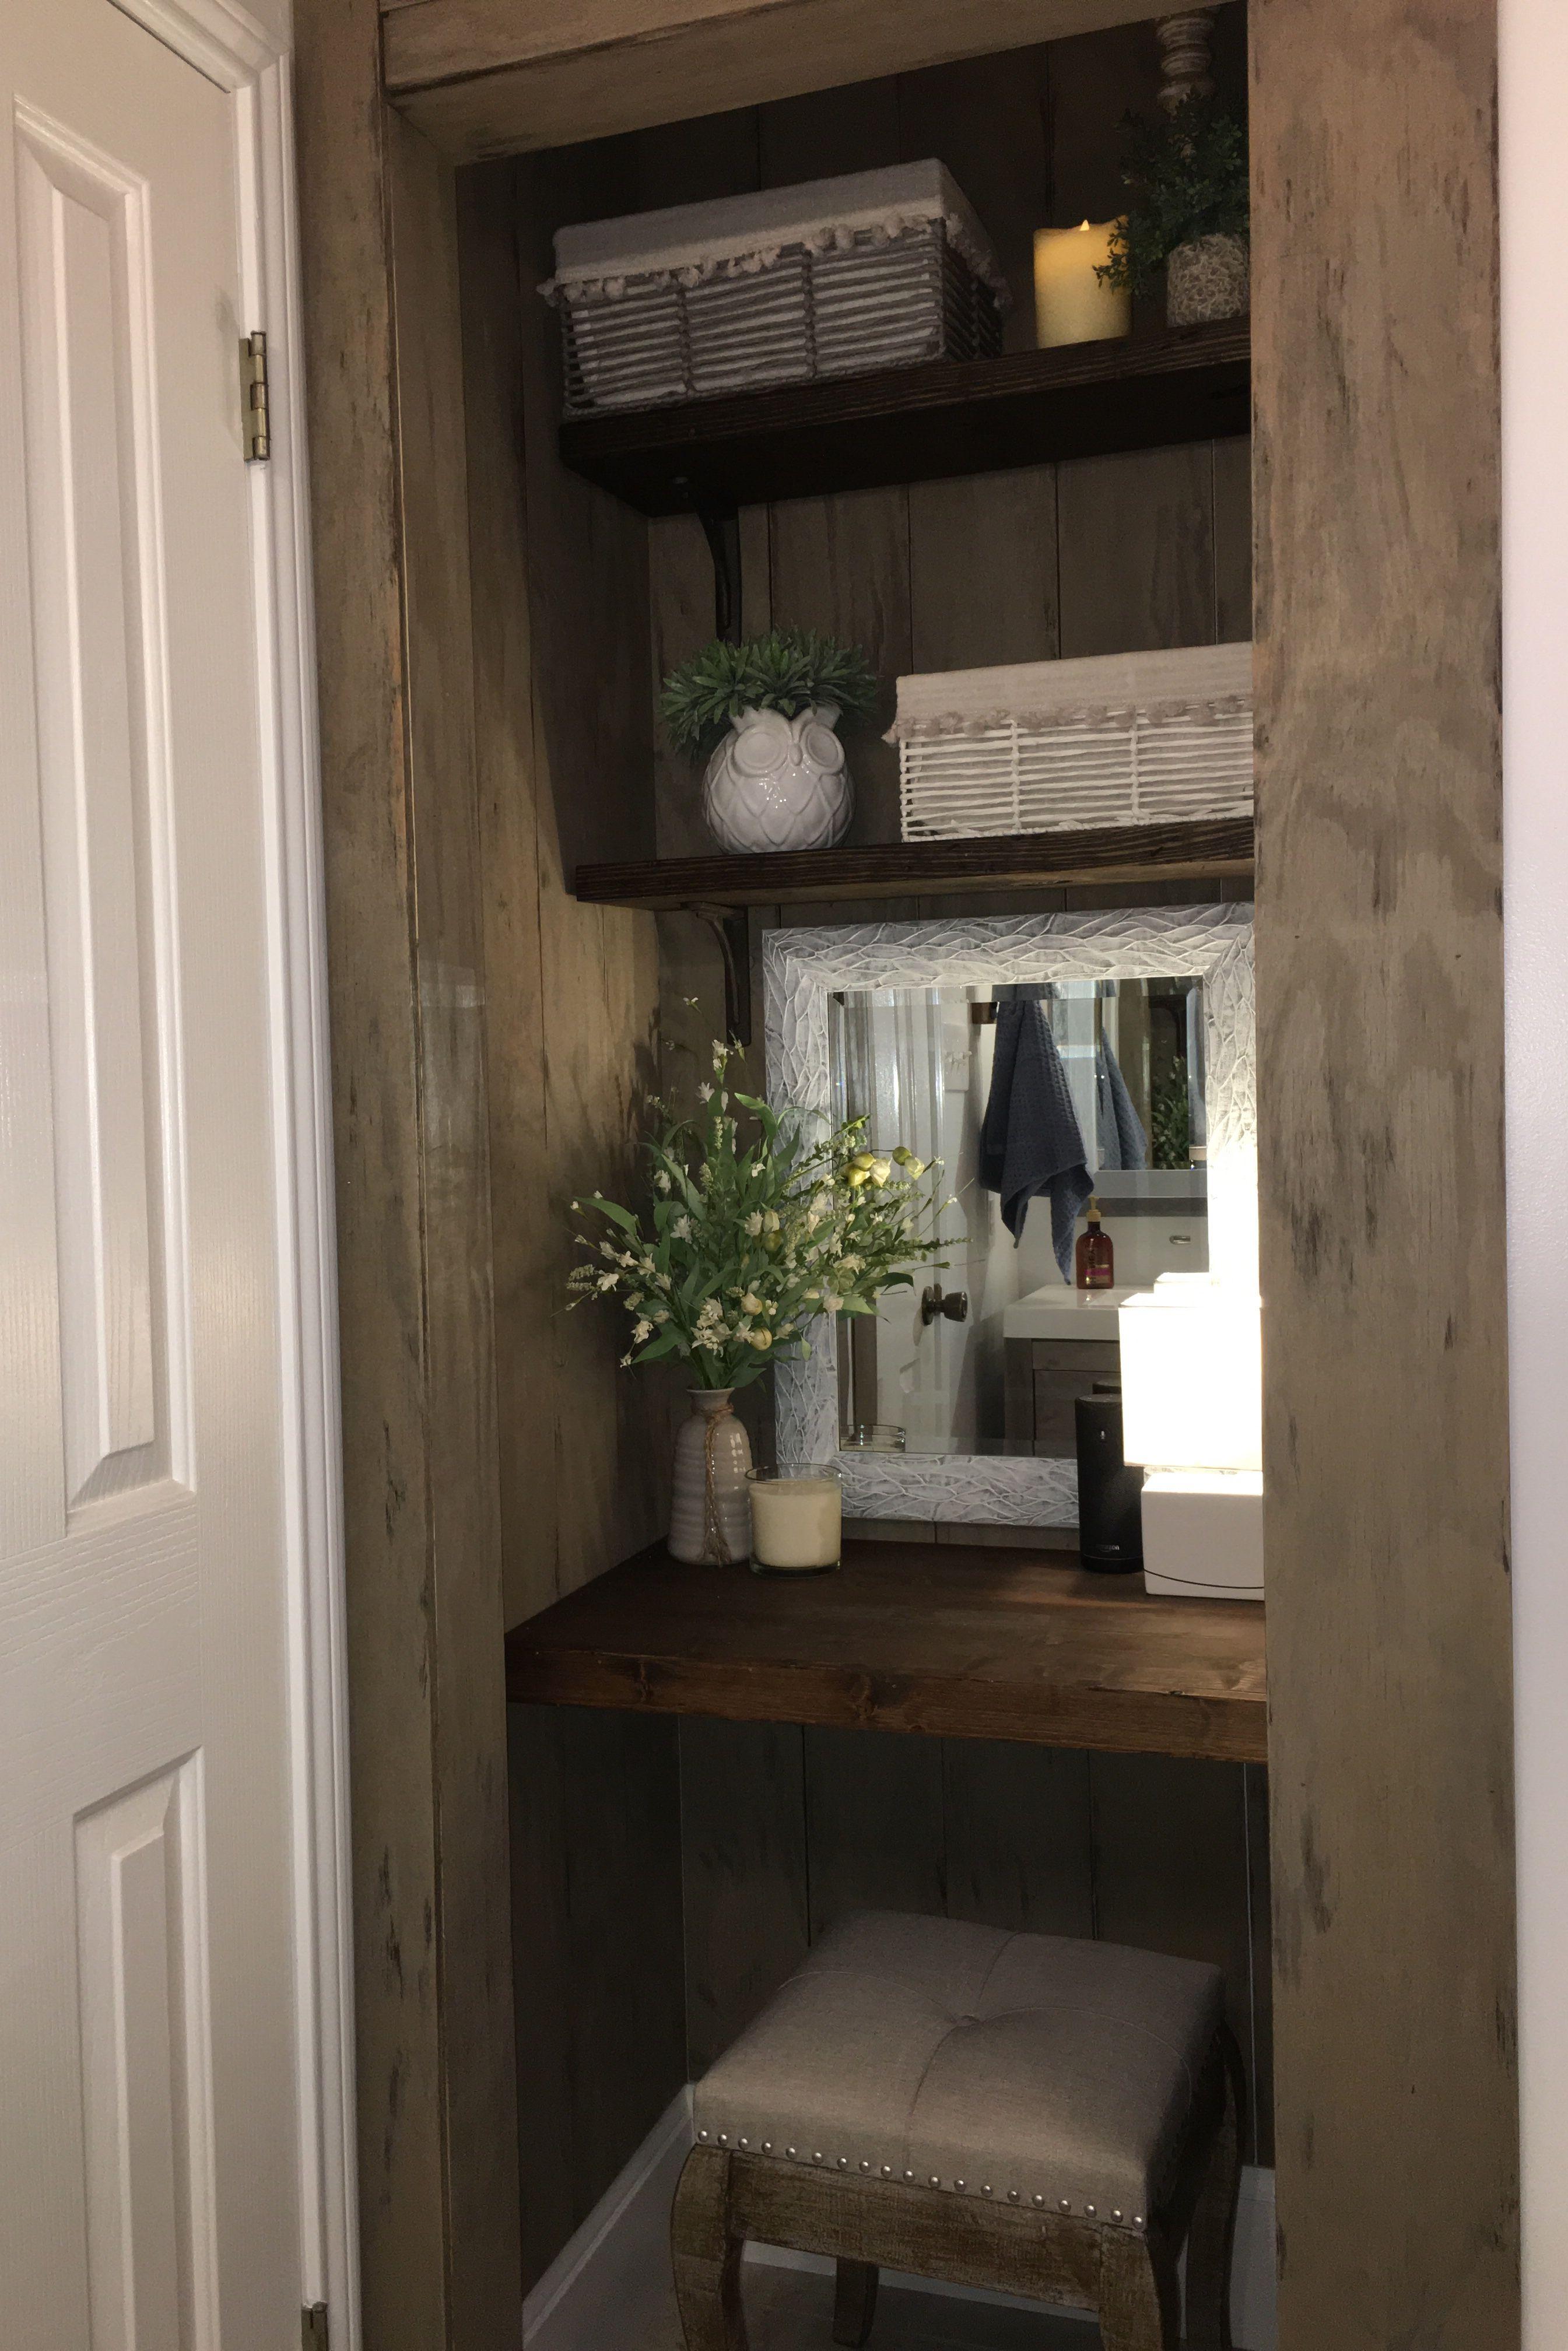 Turn an awkward linen closet into an adorable vanity space